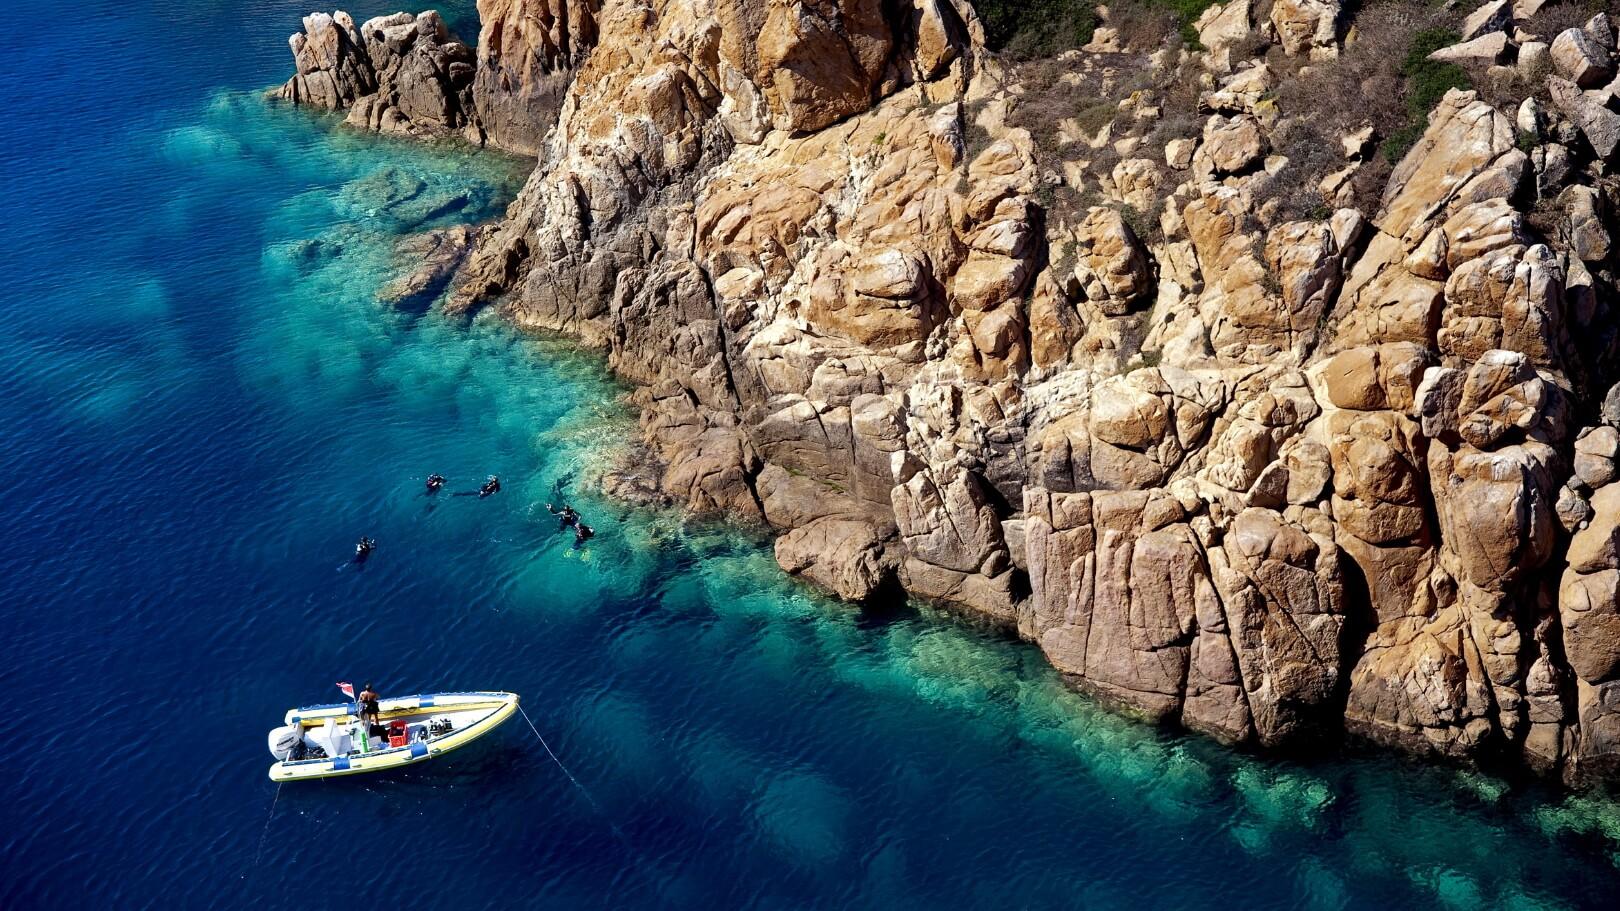 https://www.chialagunaresort.com/wp-content/uploads/2021/05/IHC_Chia-Laguna-Resort_grid_diving-2.jpg